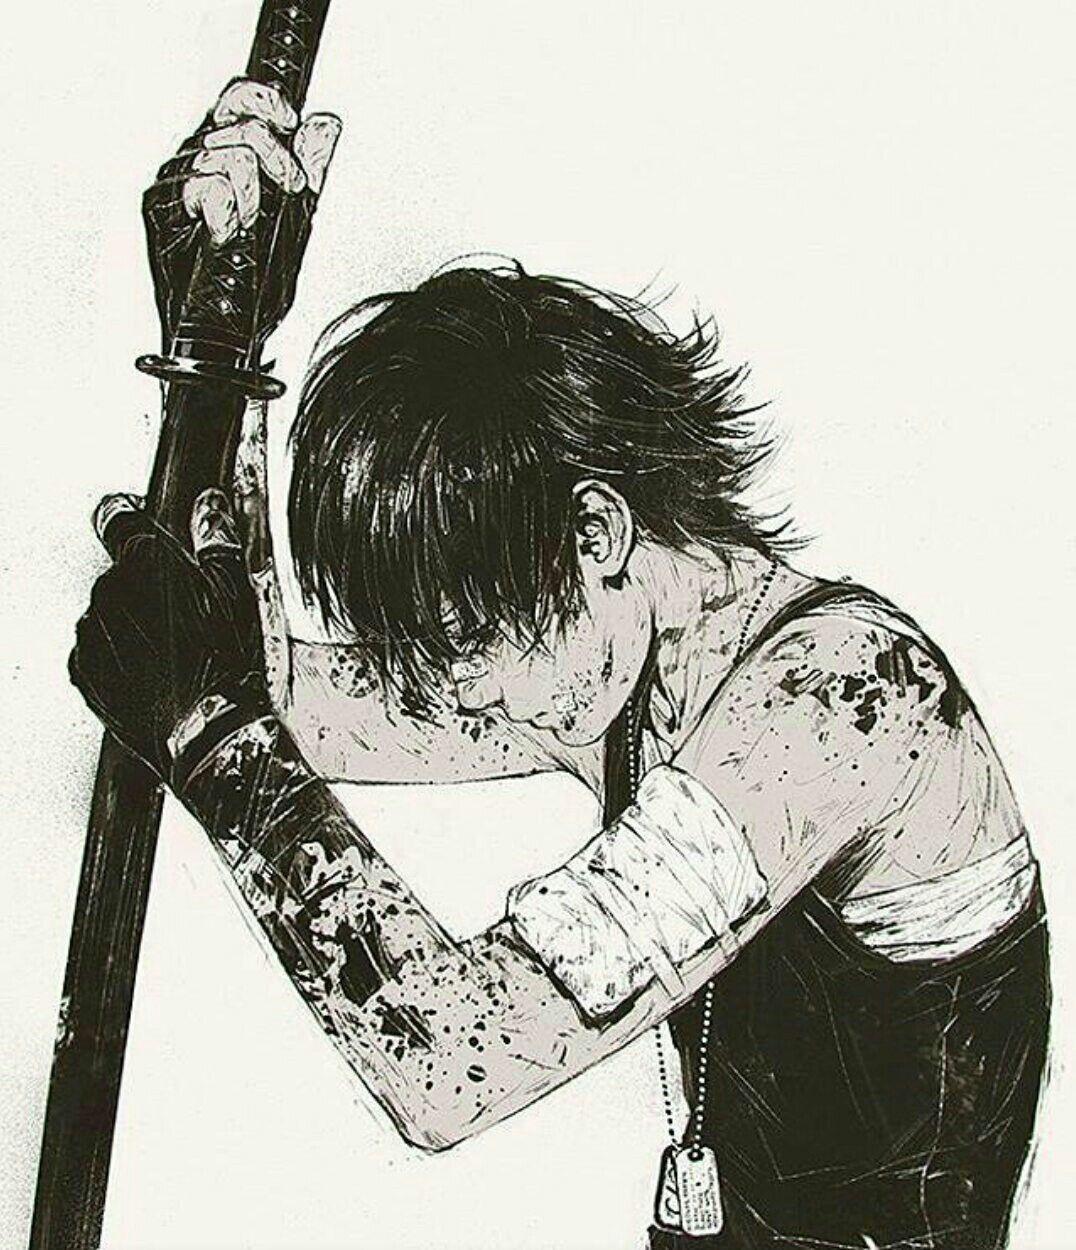 Épinglé par Zeynemin 7_7 sur Samurai Dessin manga